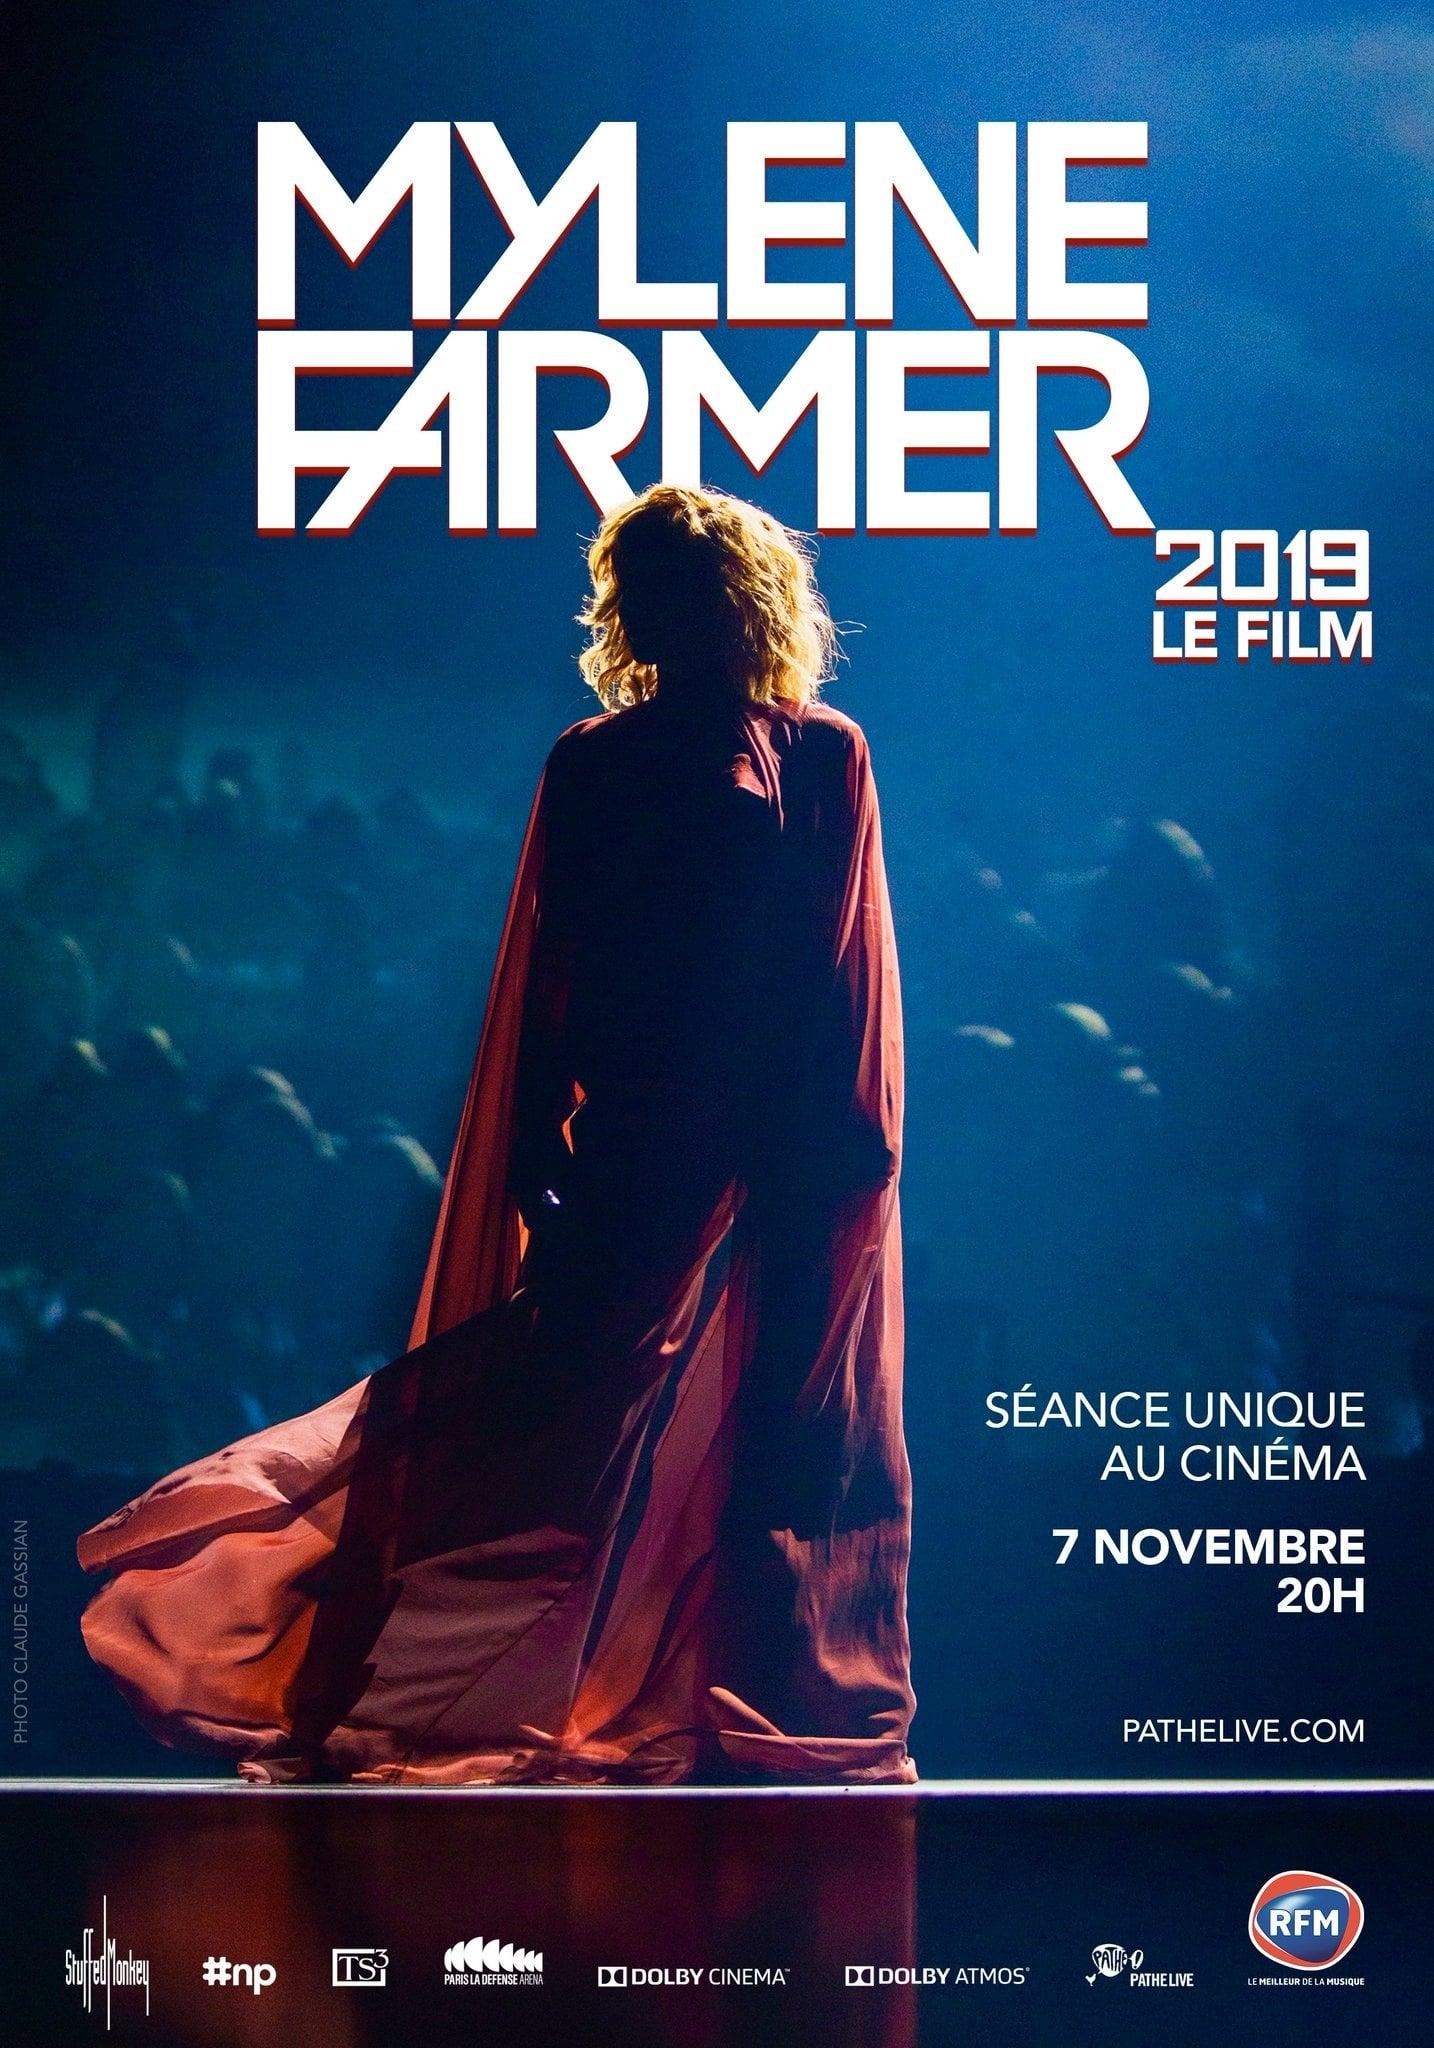 Mylene Farmer 2019 - The Film (2019)